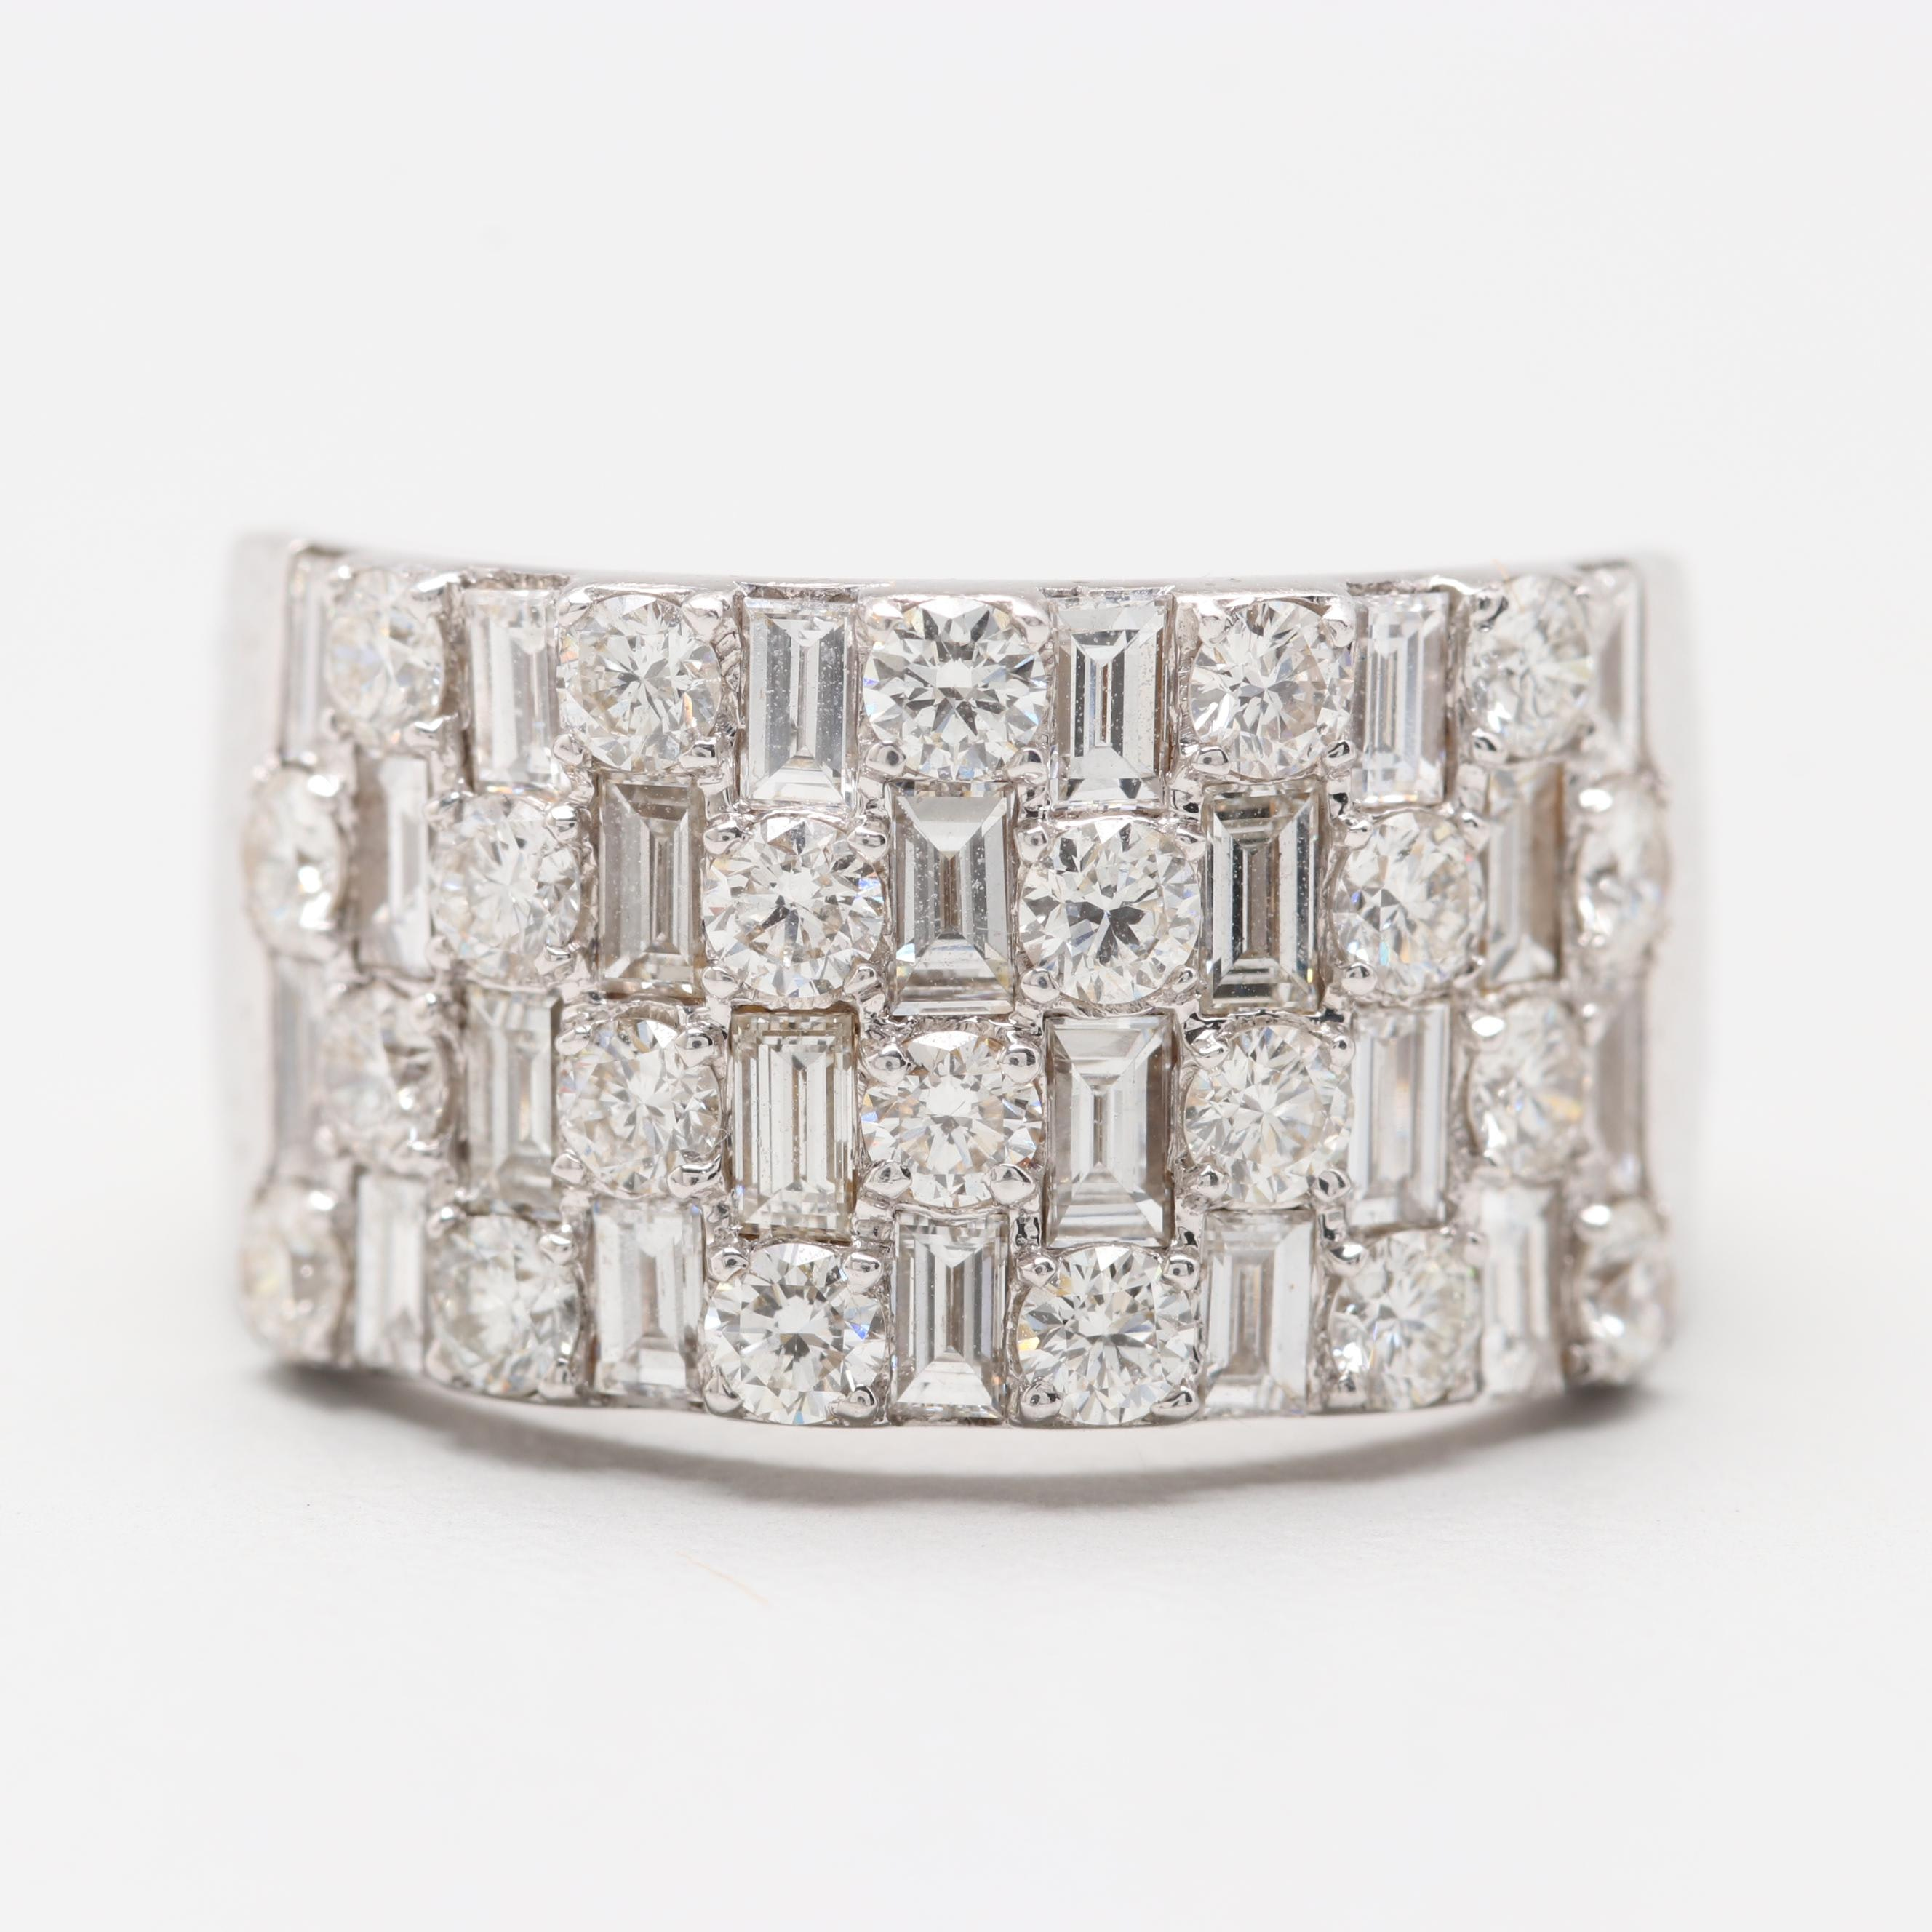 Bony Levy 18K White Gold 2.05 CTW Diamond Ring